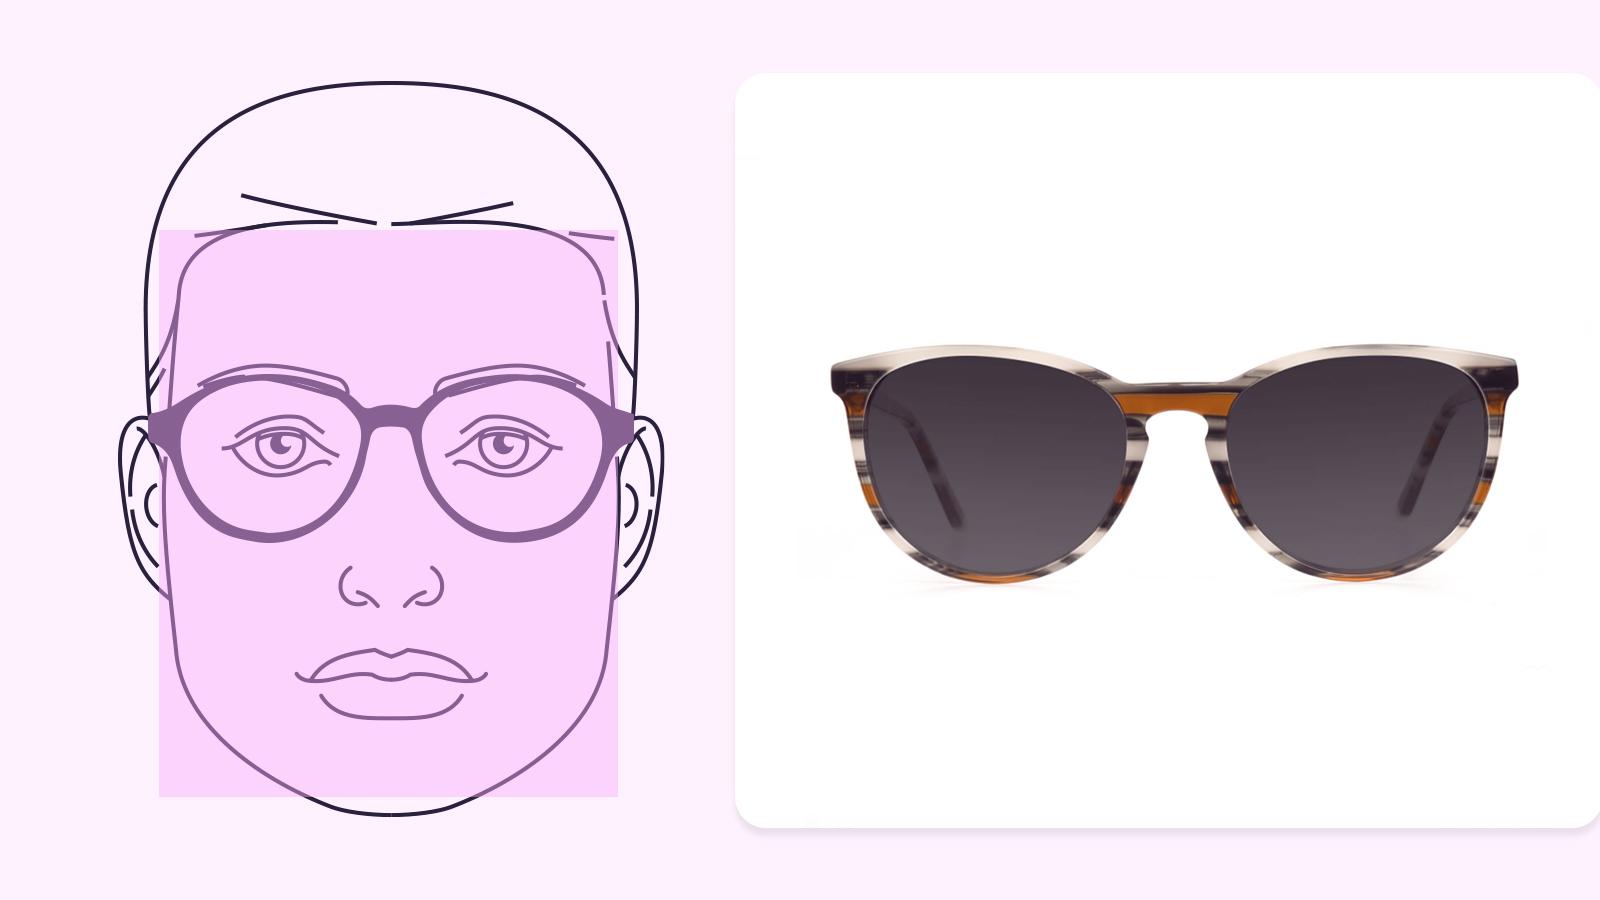 Sunglasses for square face shape